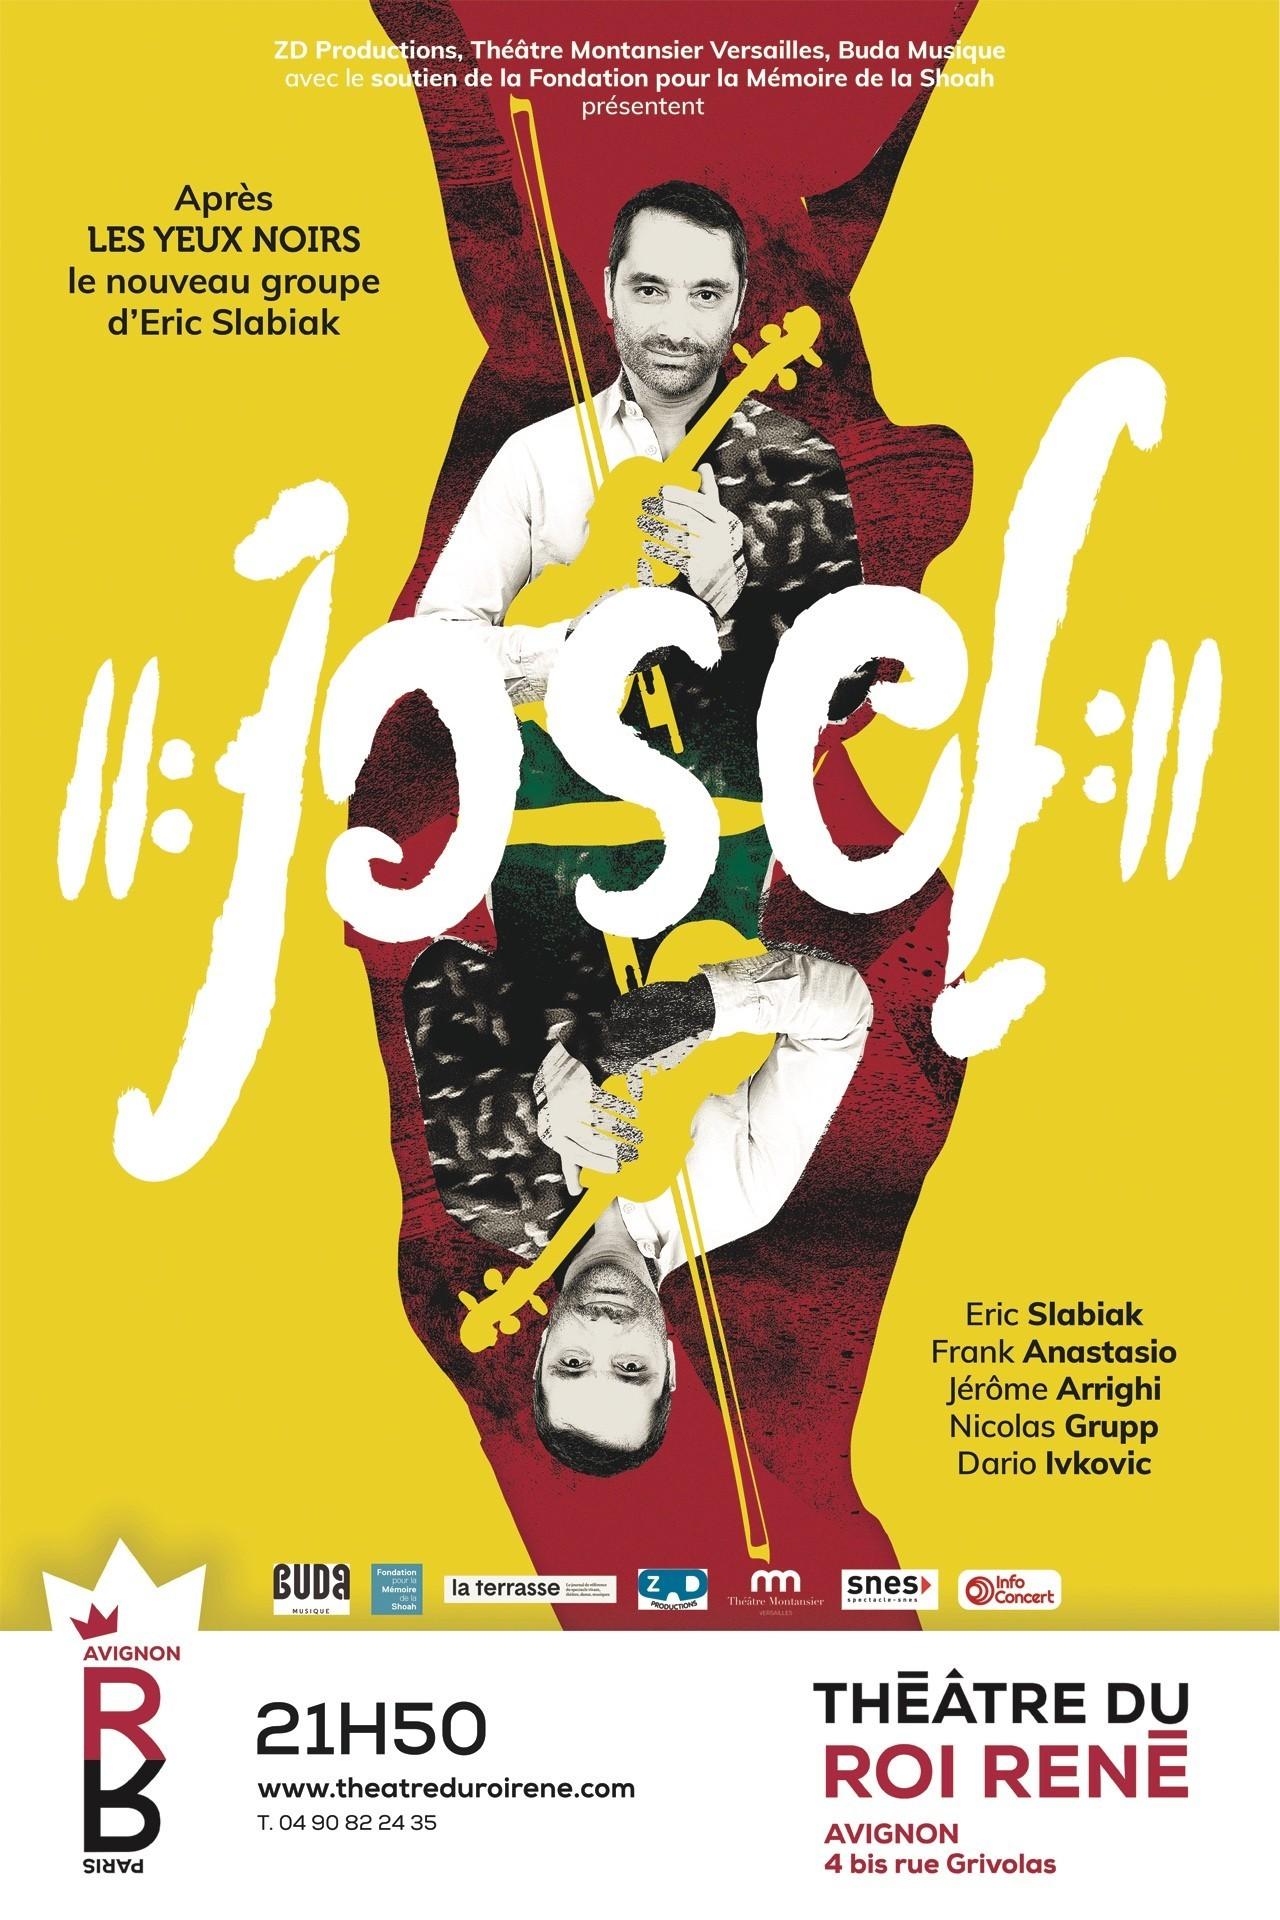 Rosemary-Avignon-Josef Josef-Avignon-ParisBazaar